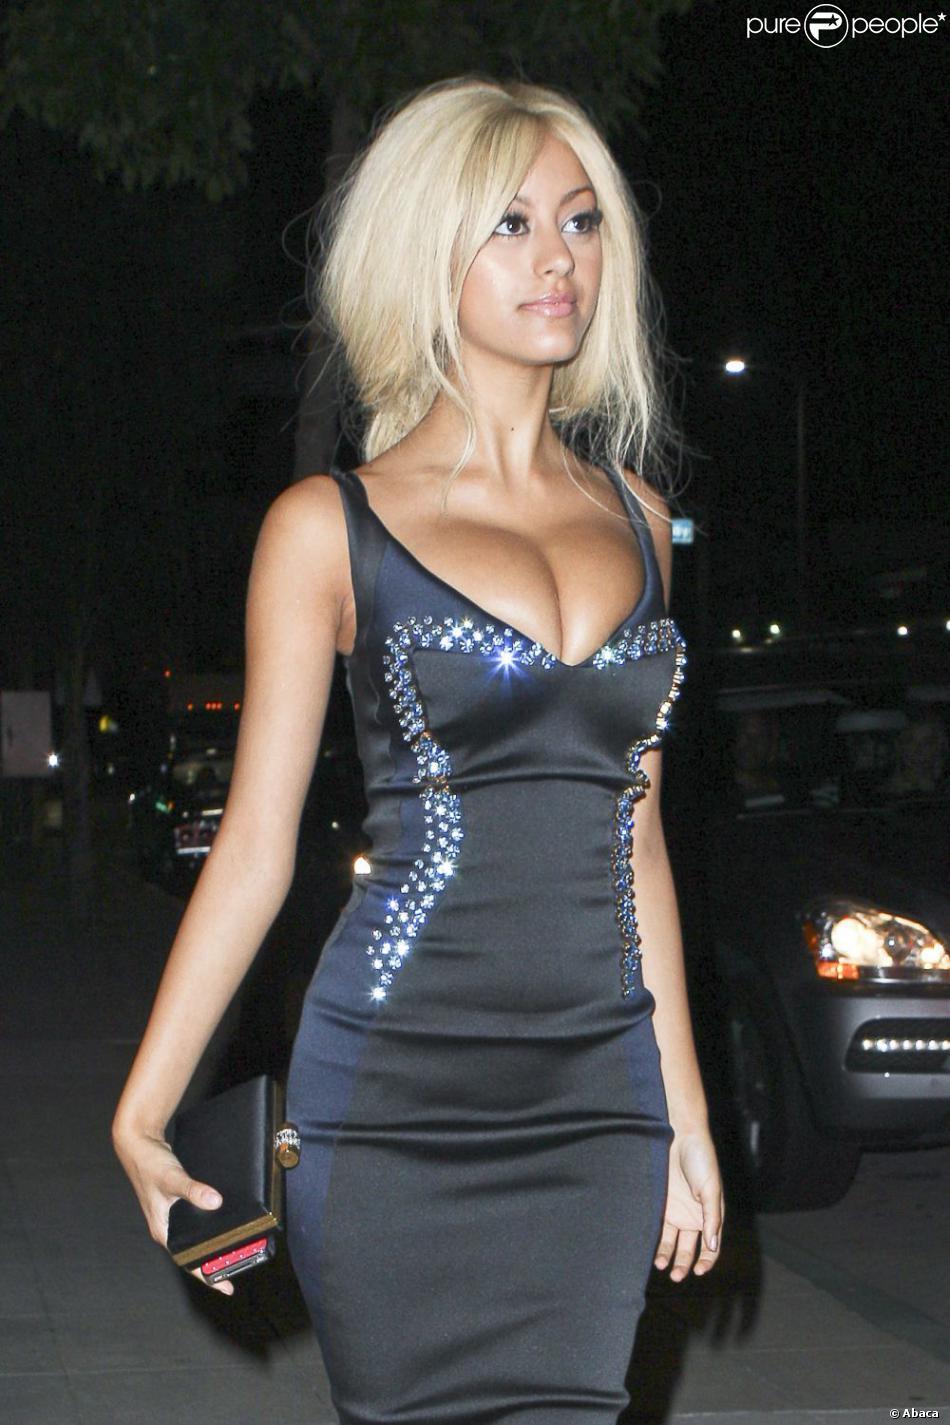 966729-french-lingerie-designer-zahia-de